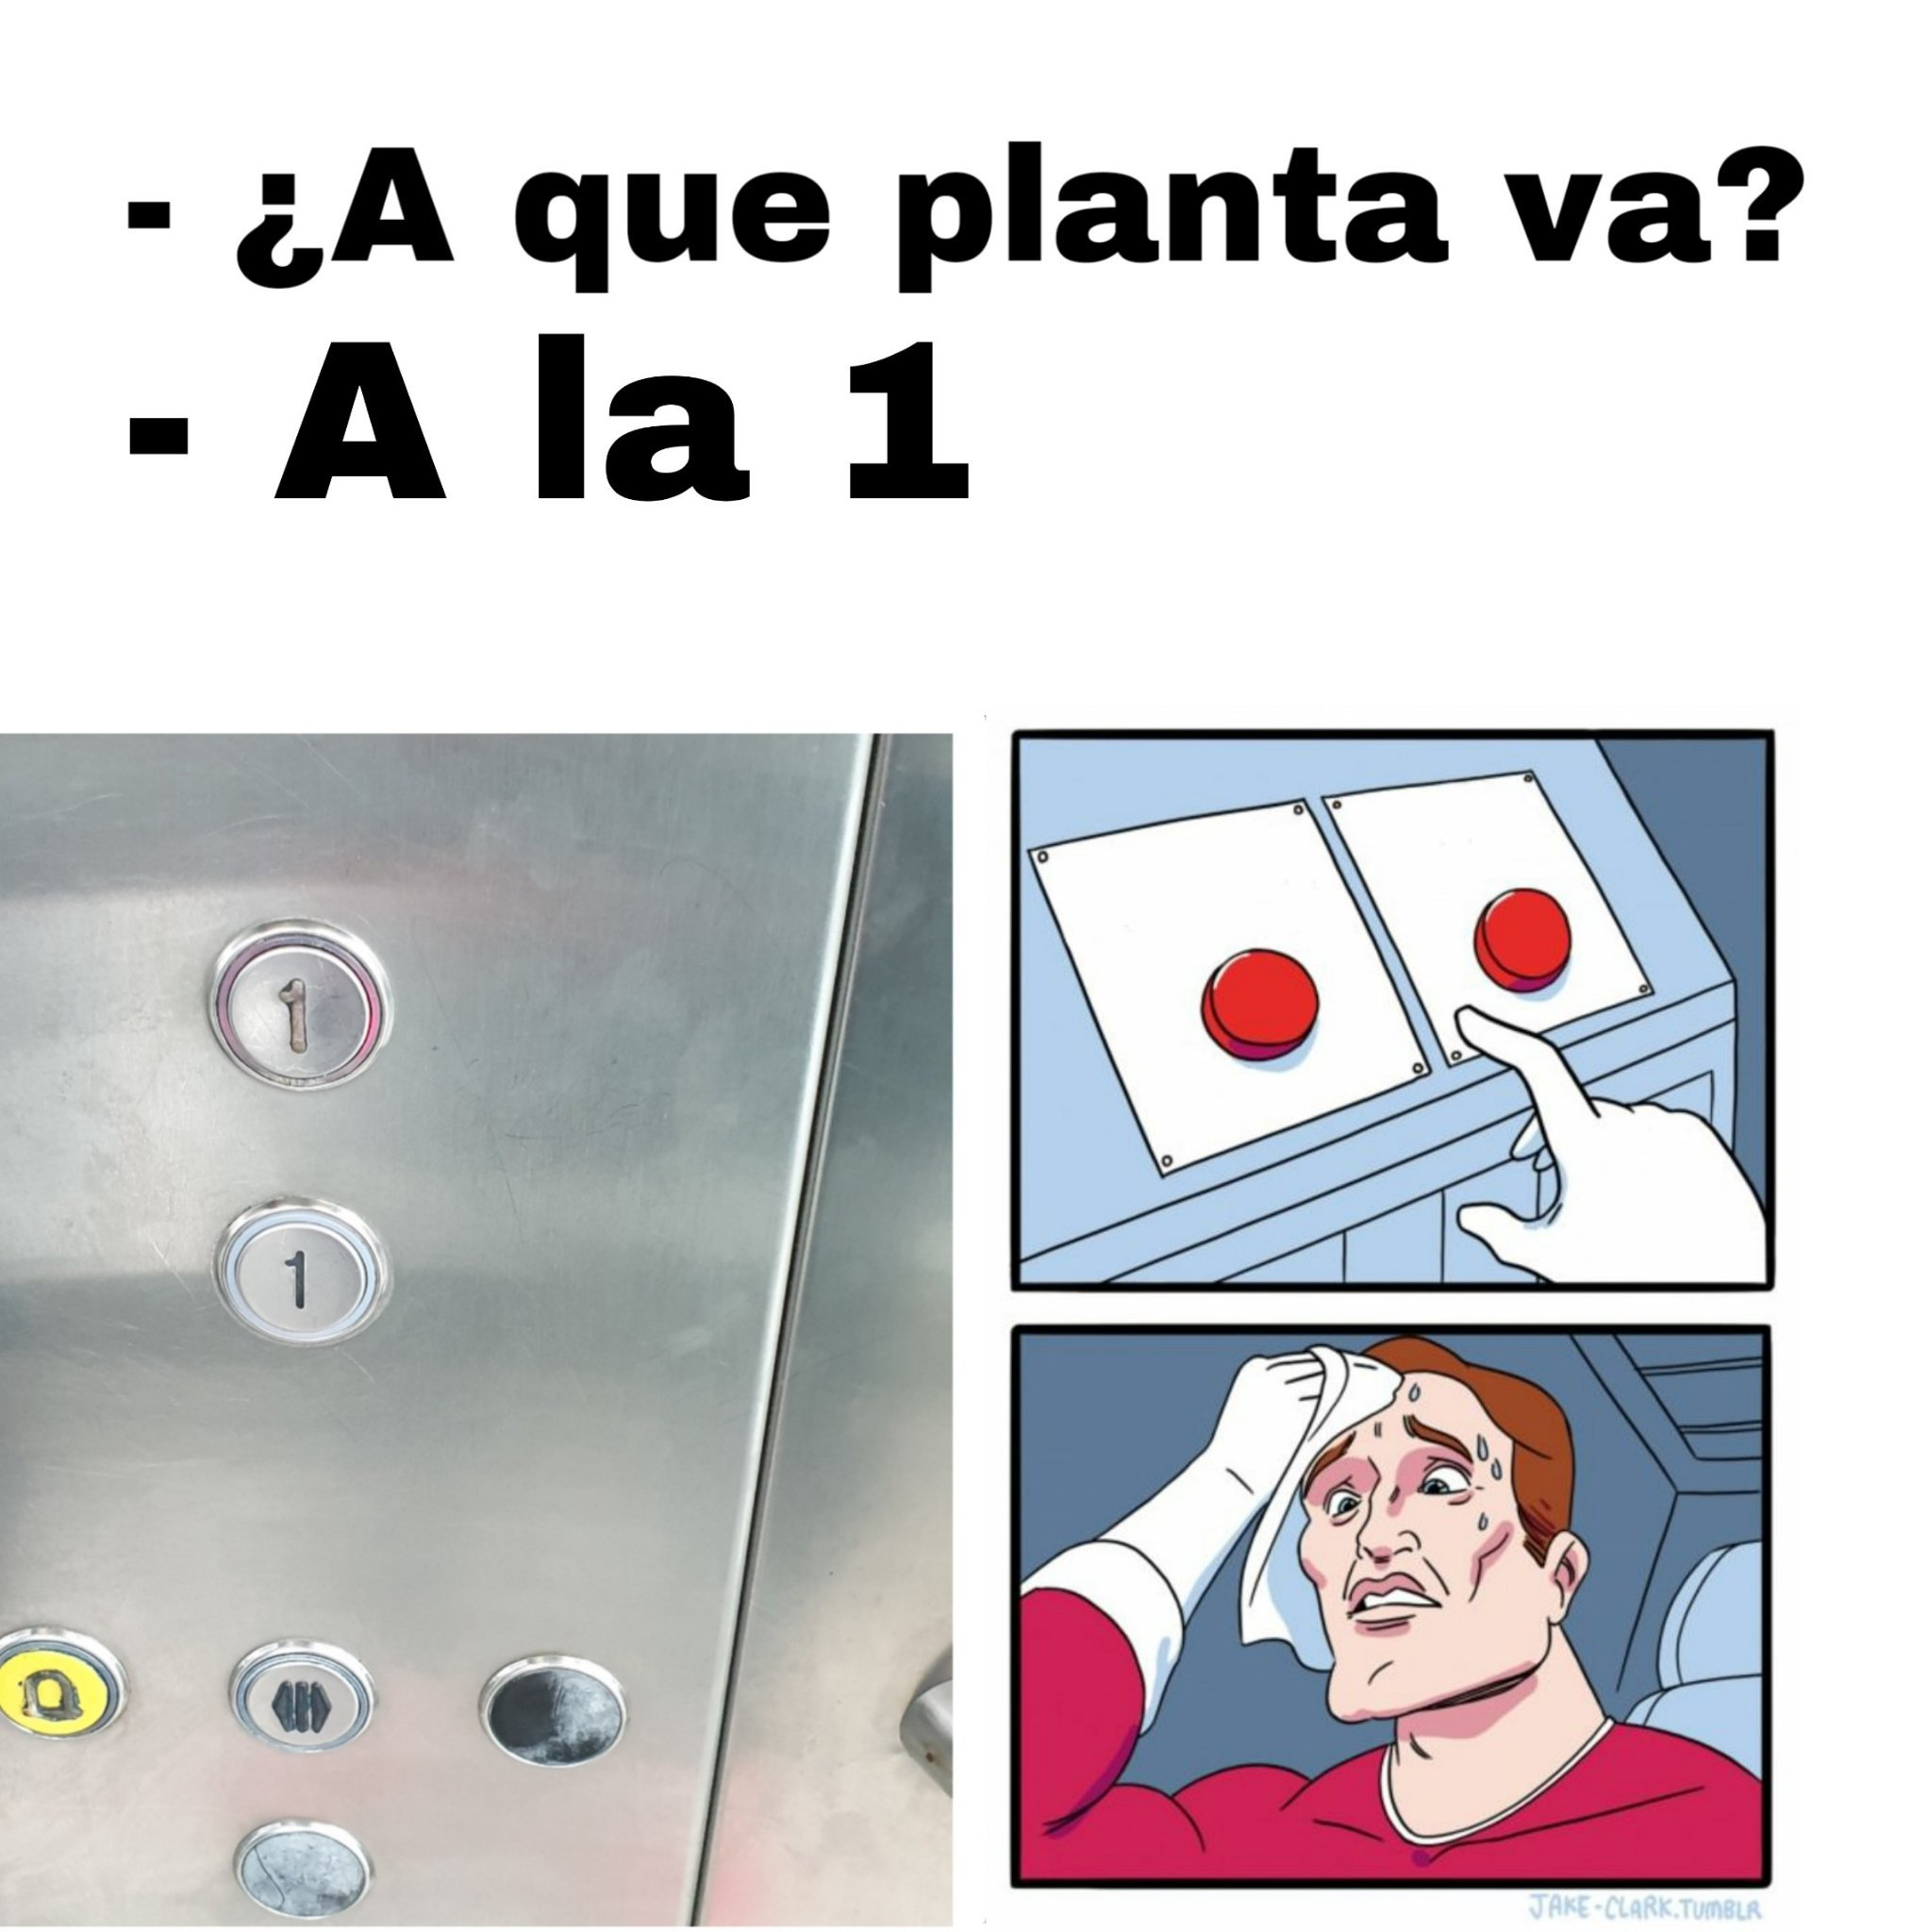 planta 1 planta 1 - meme